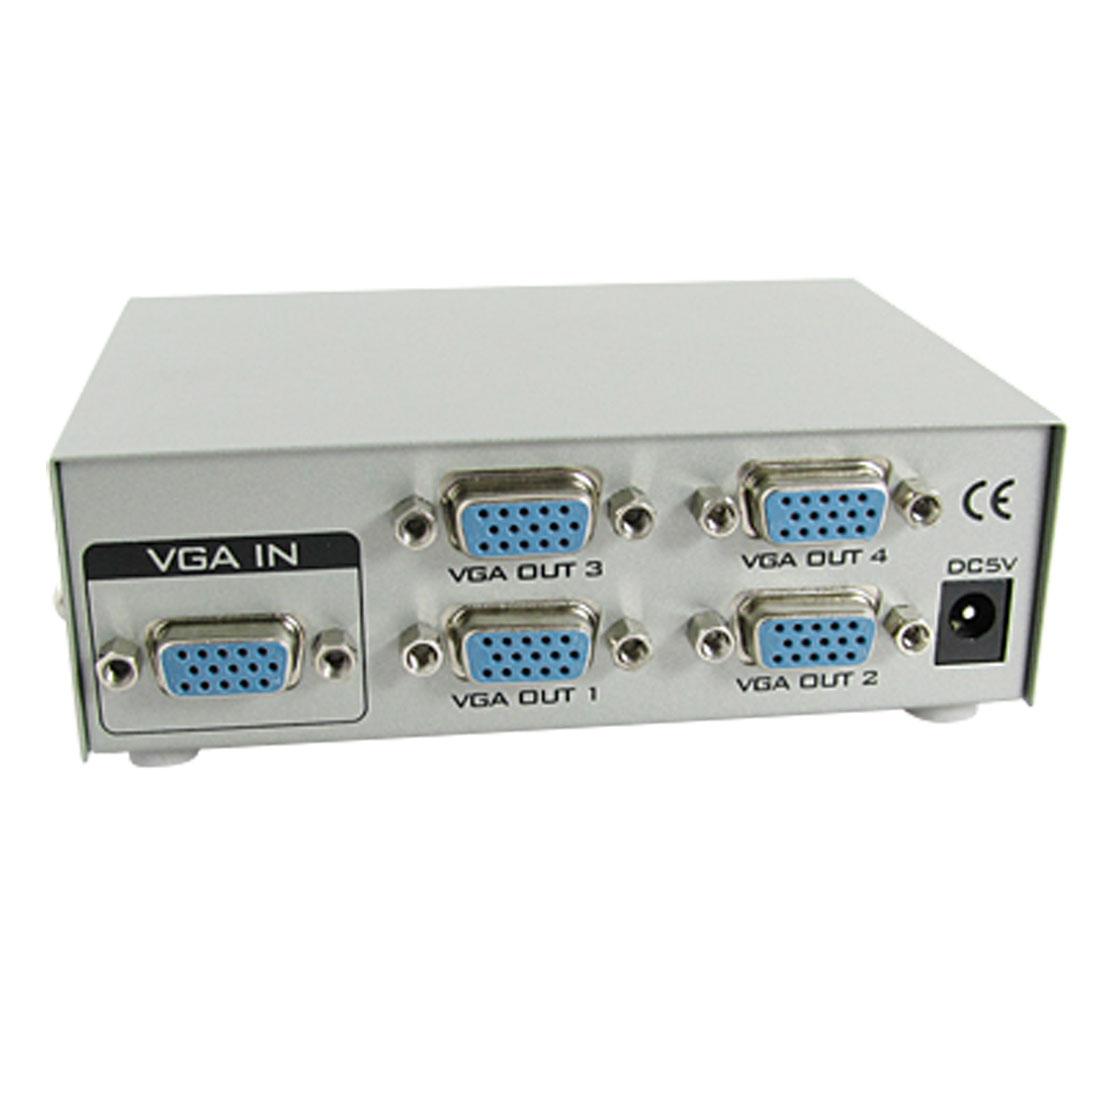 US Plug AC 110-240V 4 Port VGA Video Display Splitter 150MHz w Charger DC 5V